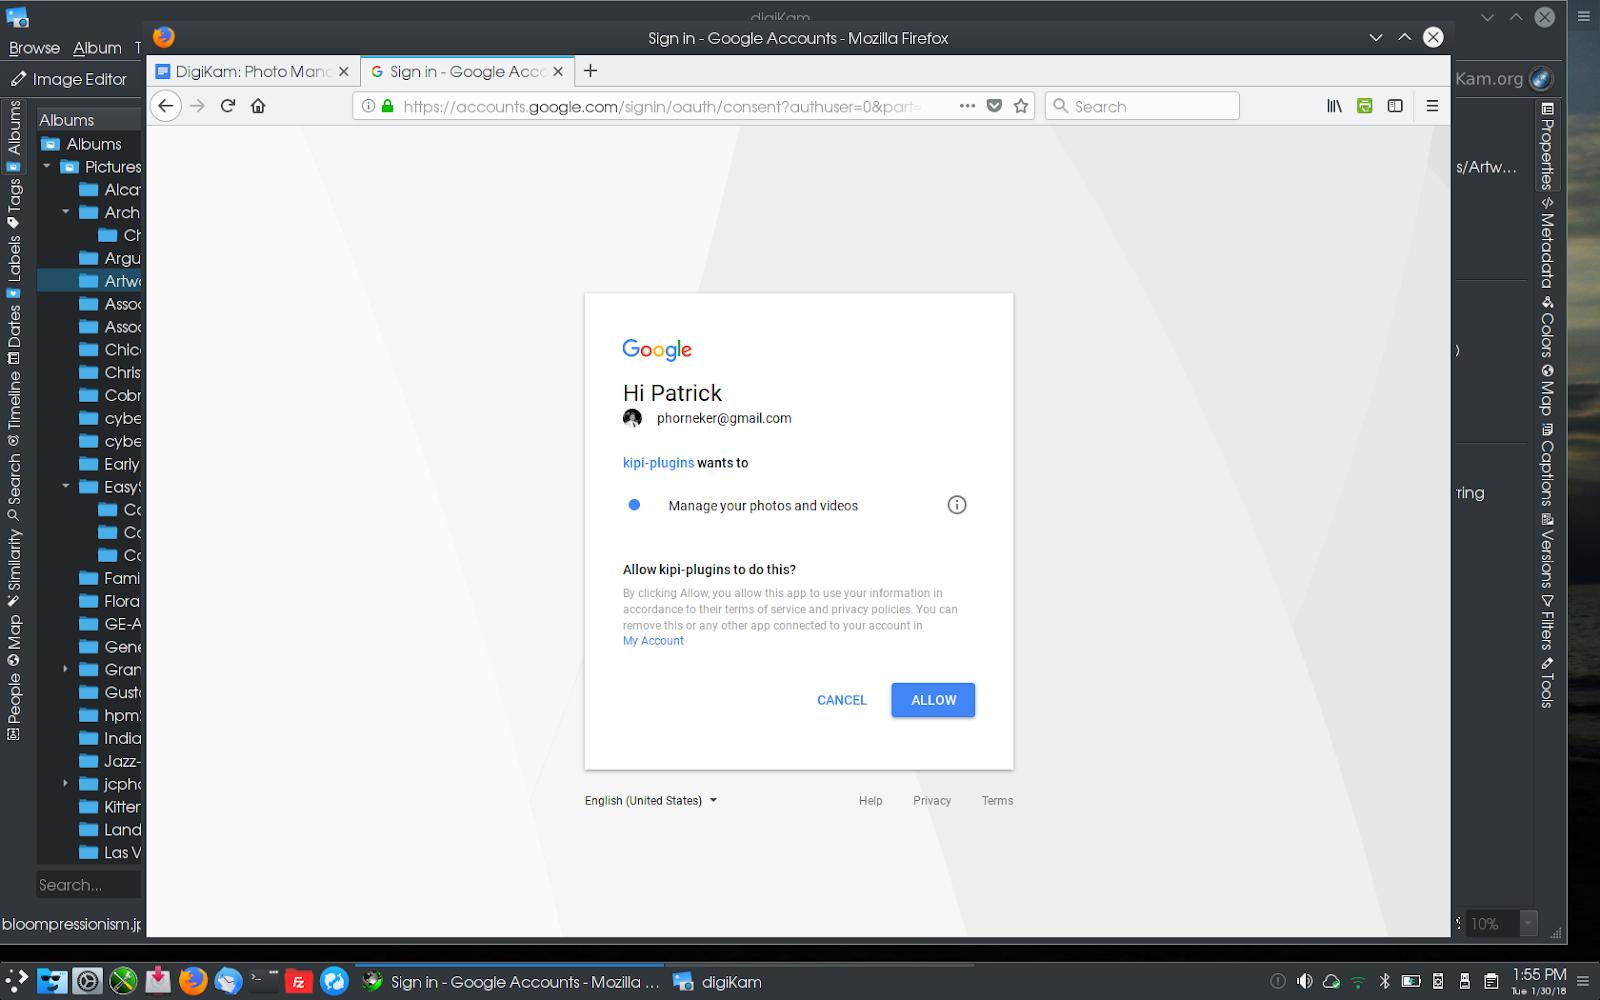 google album privacy